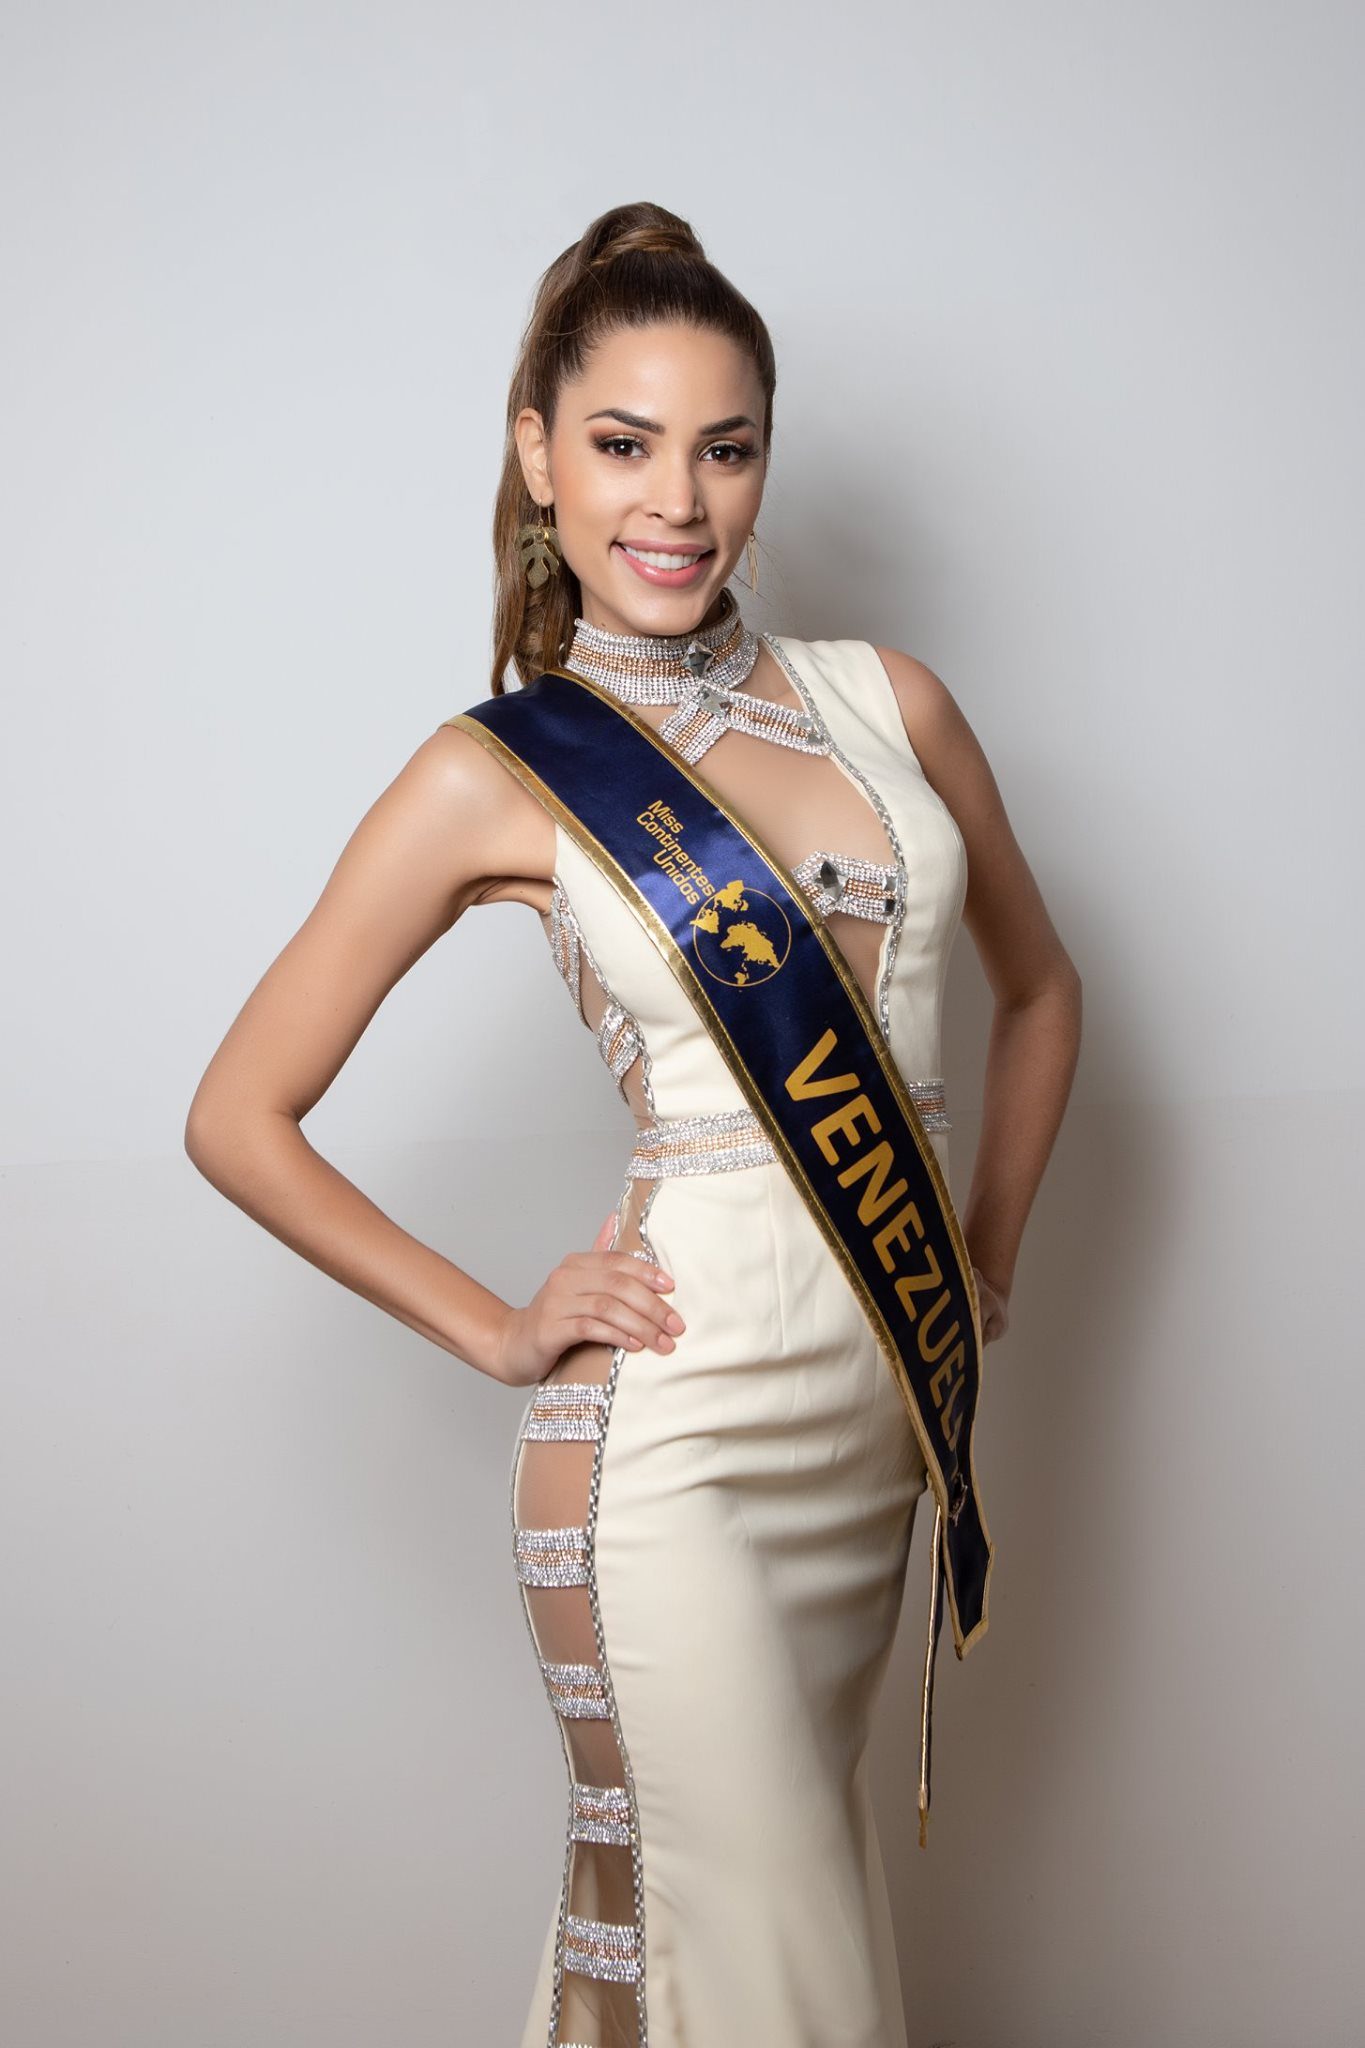 maria jose bracho, miss venezuela continentes unidos 2019. - Página 4 71934510